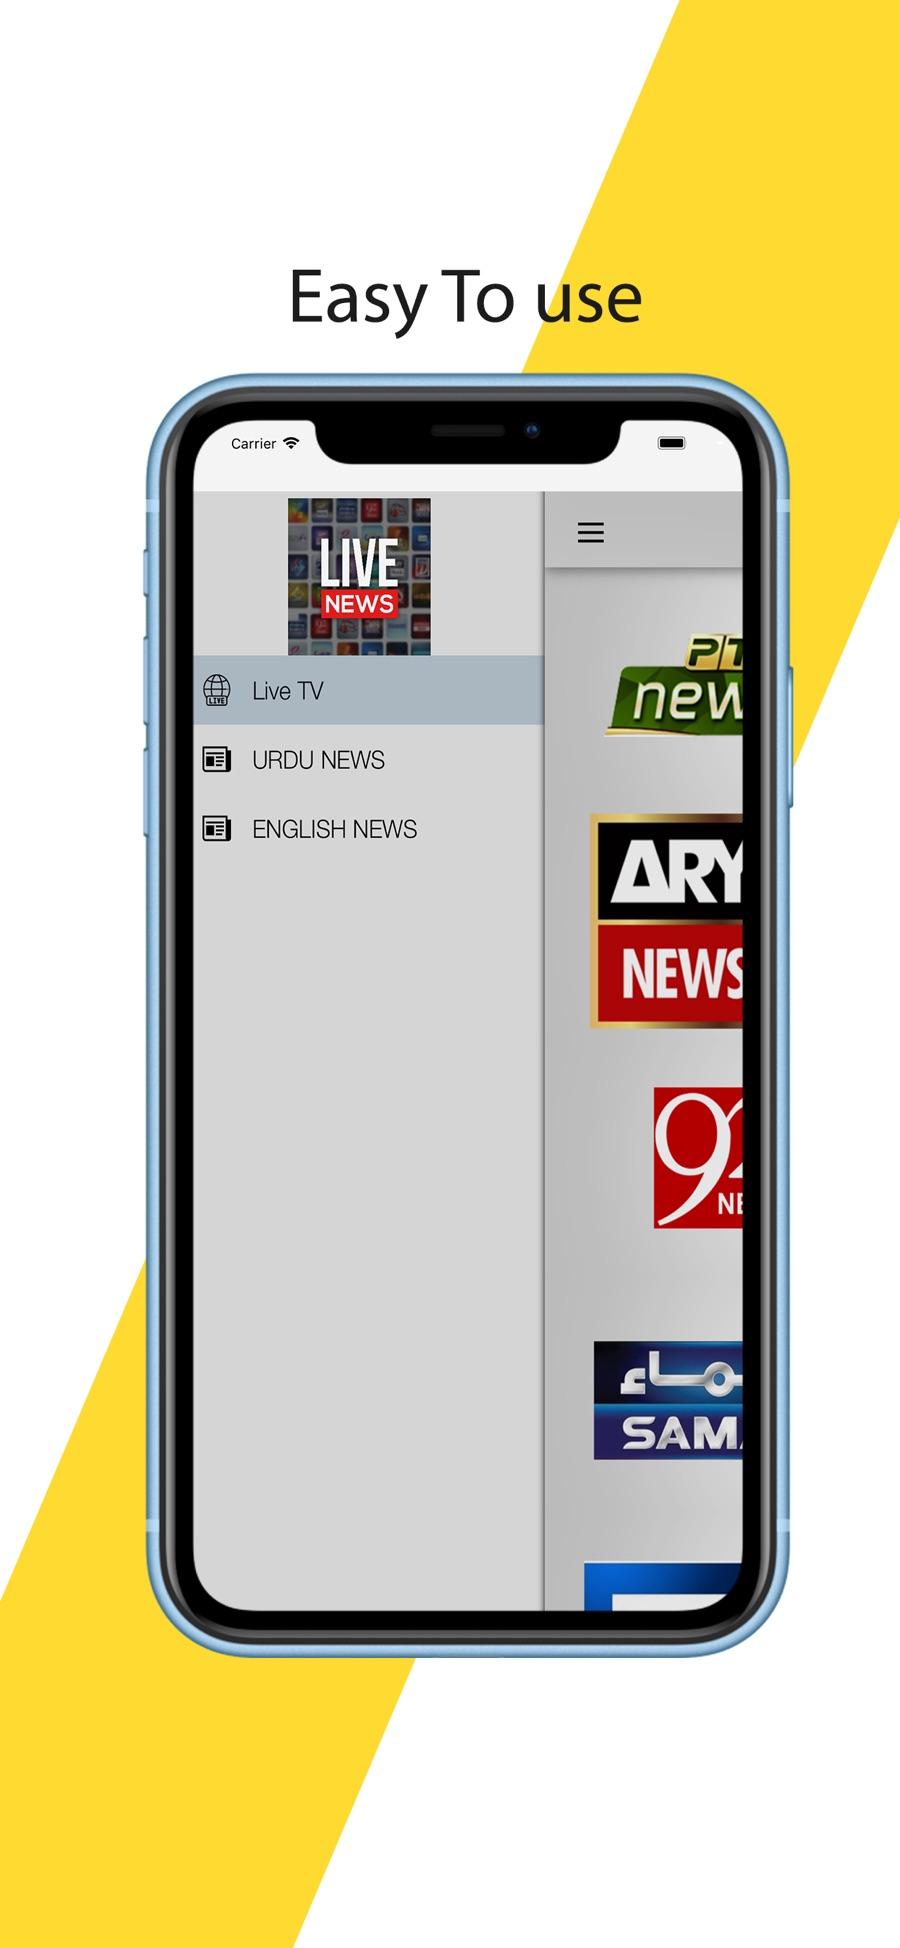 Pak News Channels